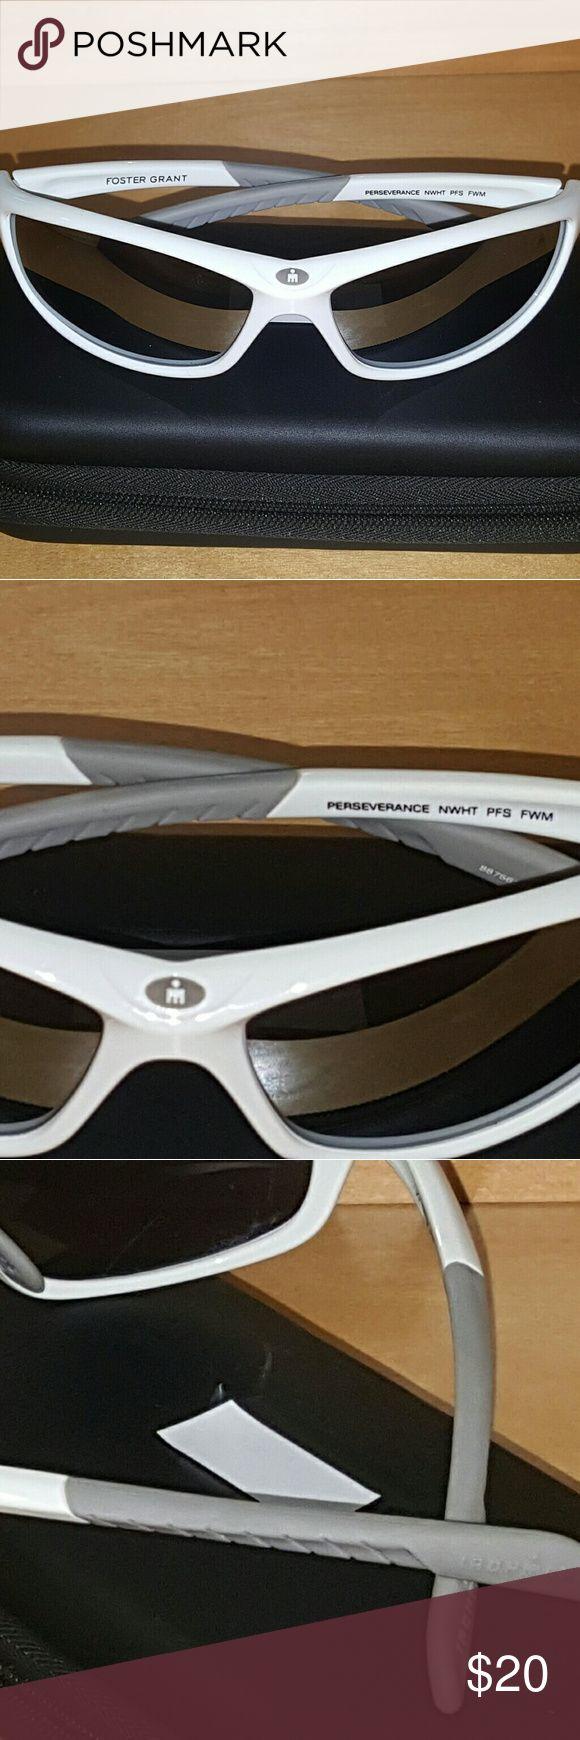 "Men's Foster Grant ""IRONMAN"" Sunglasses - White Brand New. White Frame. By Foster Grant. Sports Sunglasses Foster Grant Accessories Sunglasses"